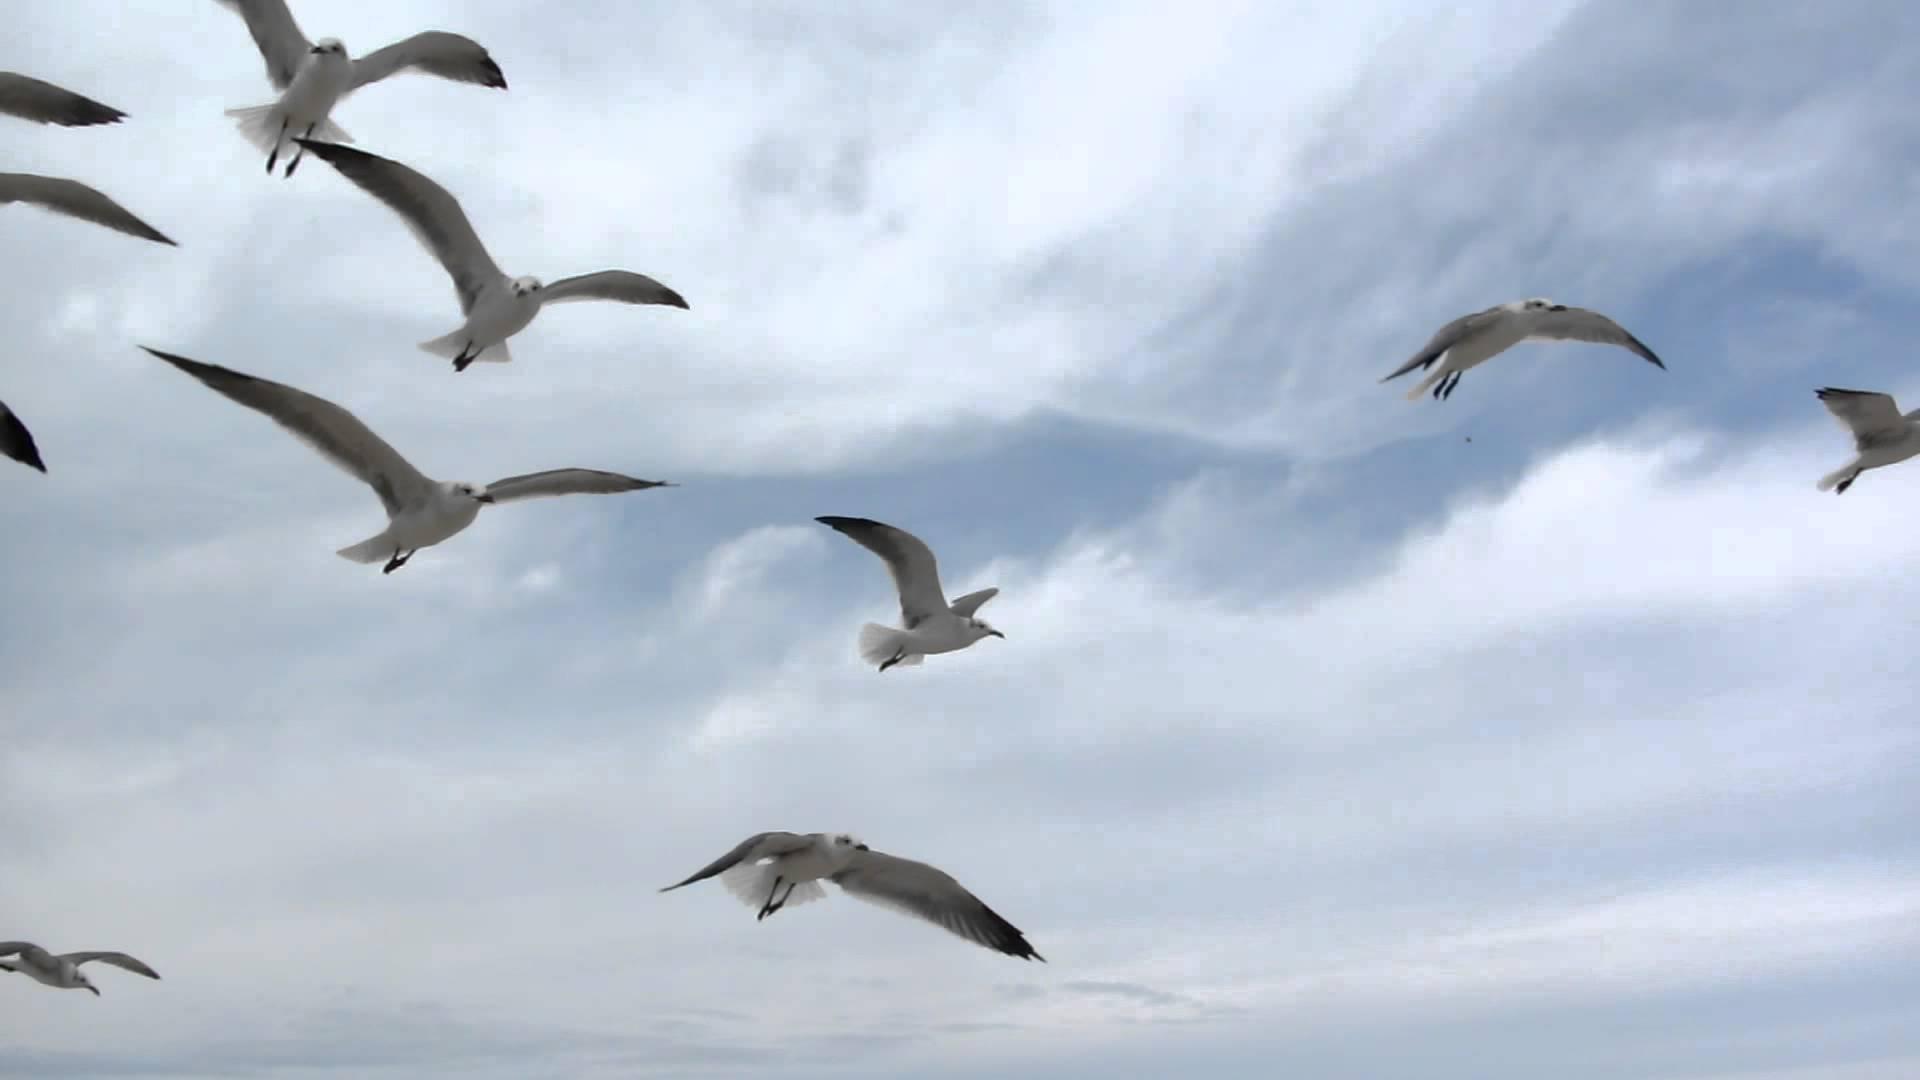 Feeding Seagulls in Corpus Christi - YouTube